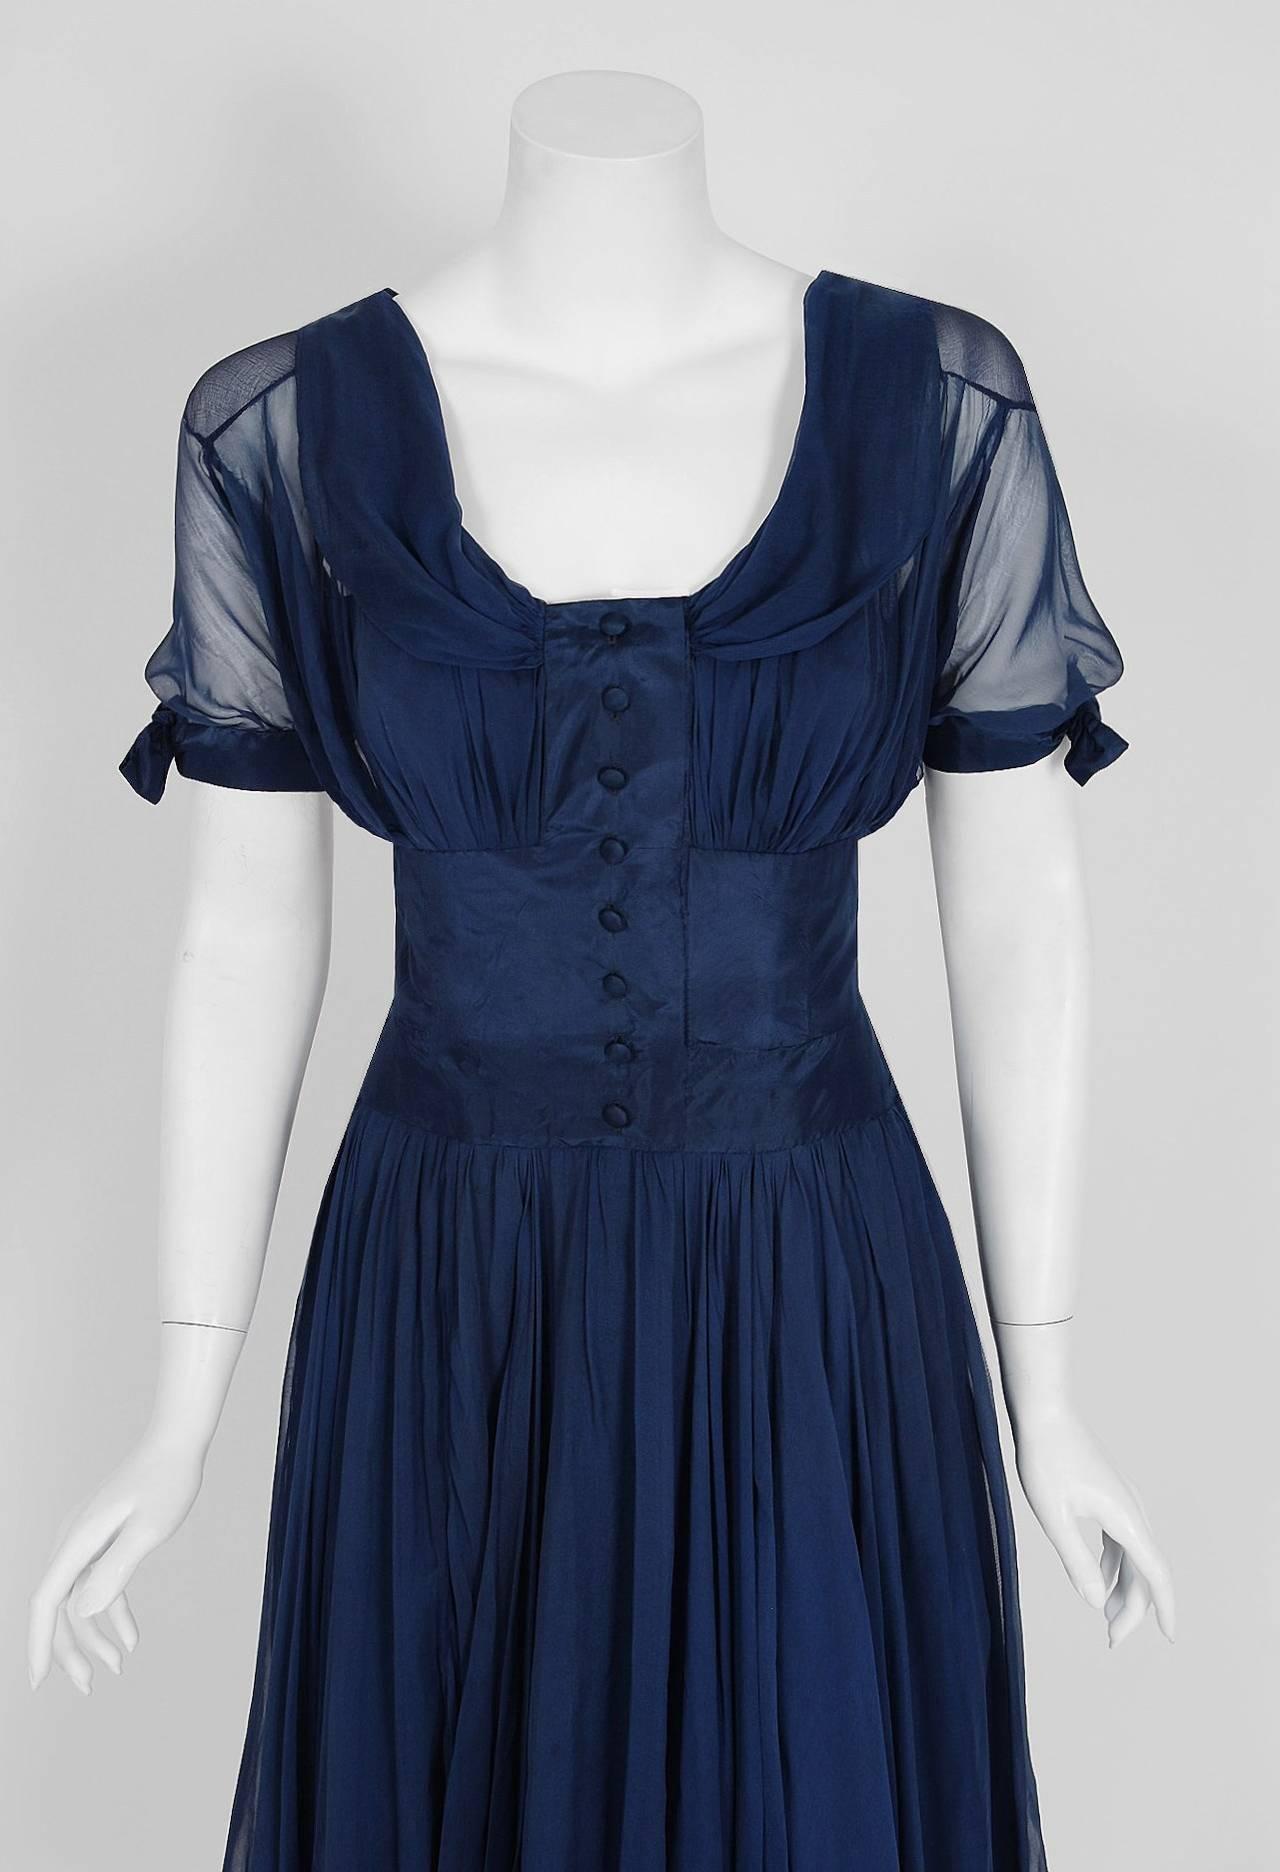 1955 Jean Desses Haute-Couture Sculpted Navy Blue Silk Shelf-Bust Party Dress 3